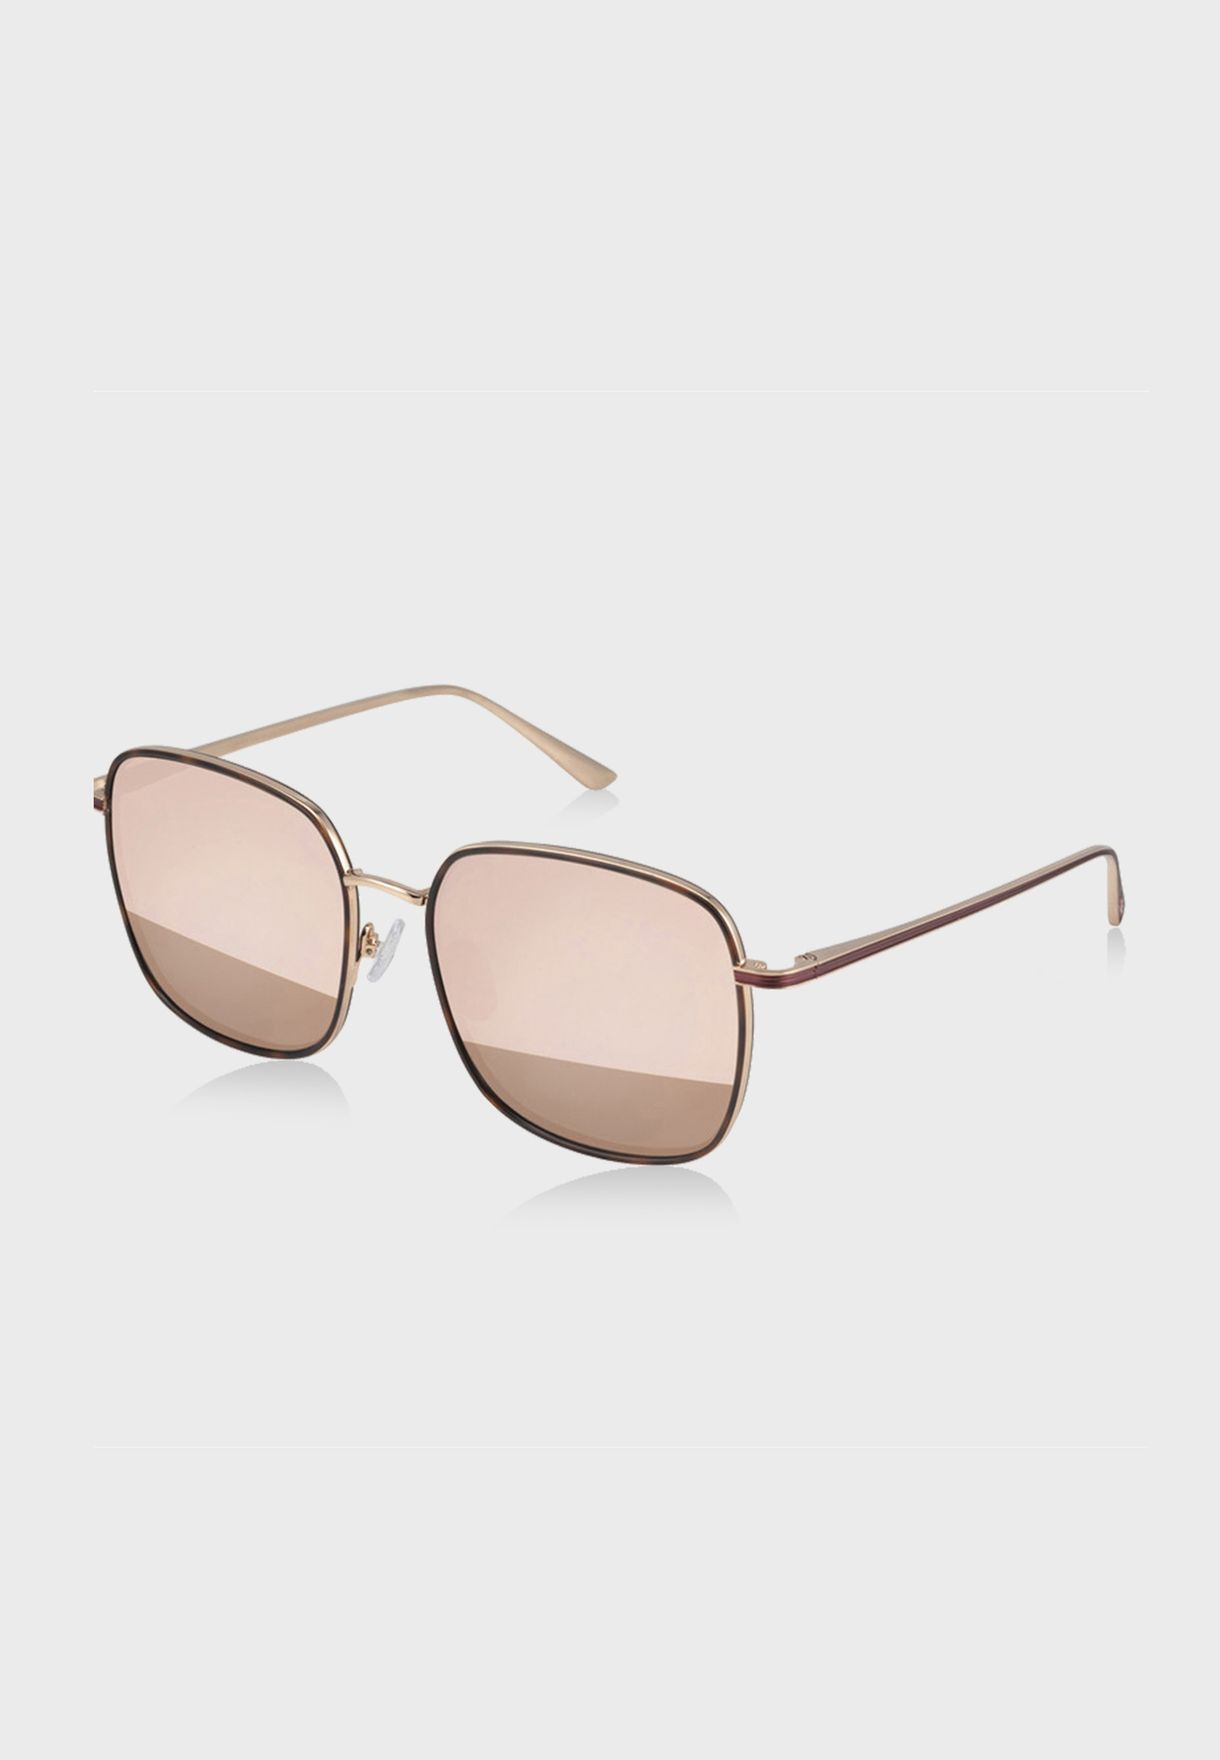 L SR779002 Oversized Sunglasses